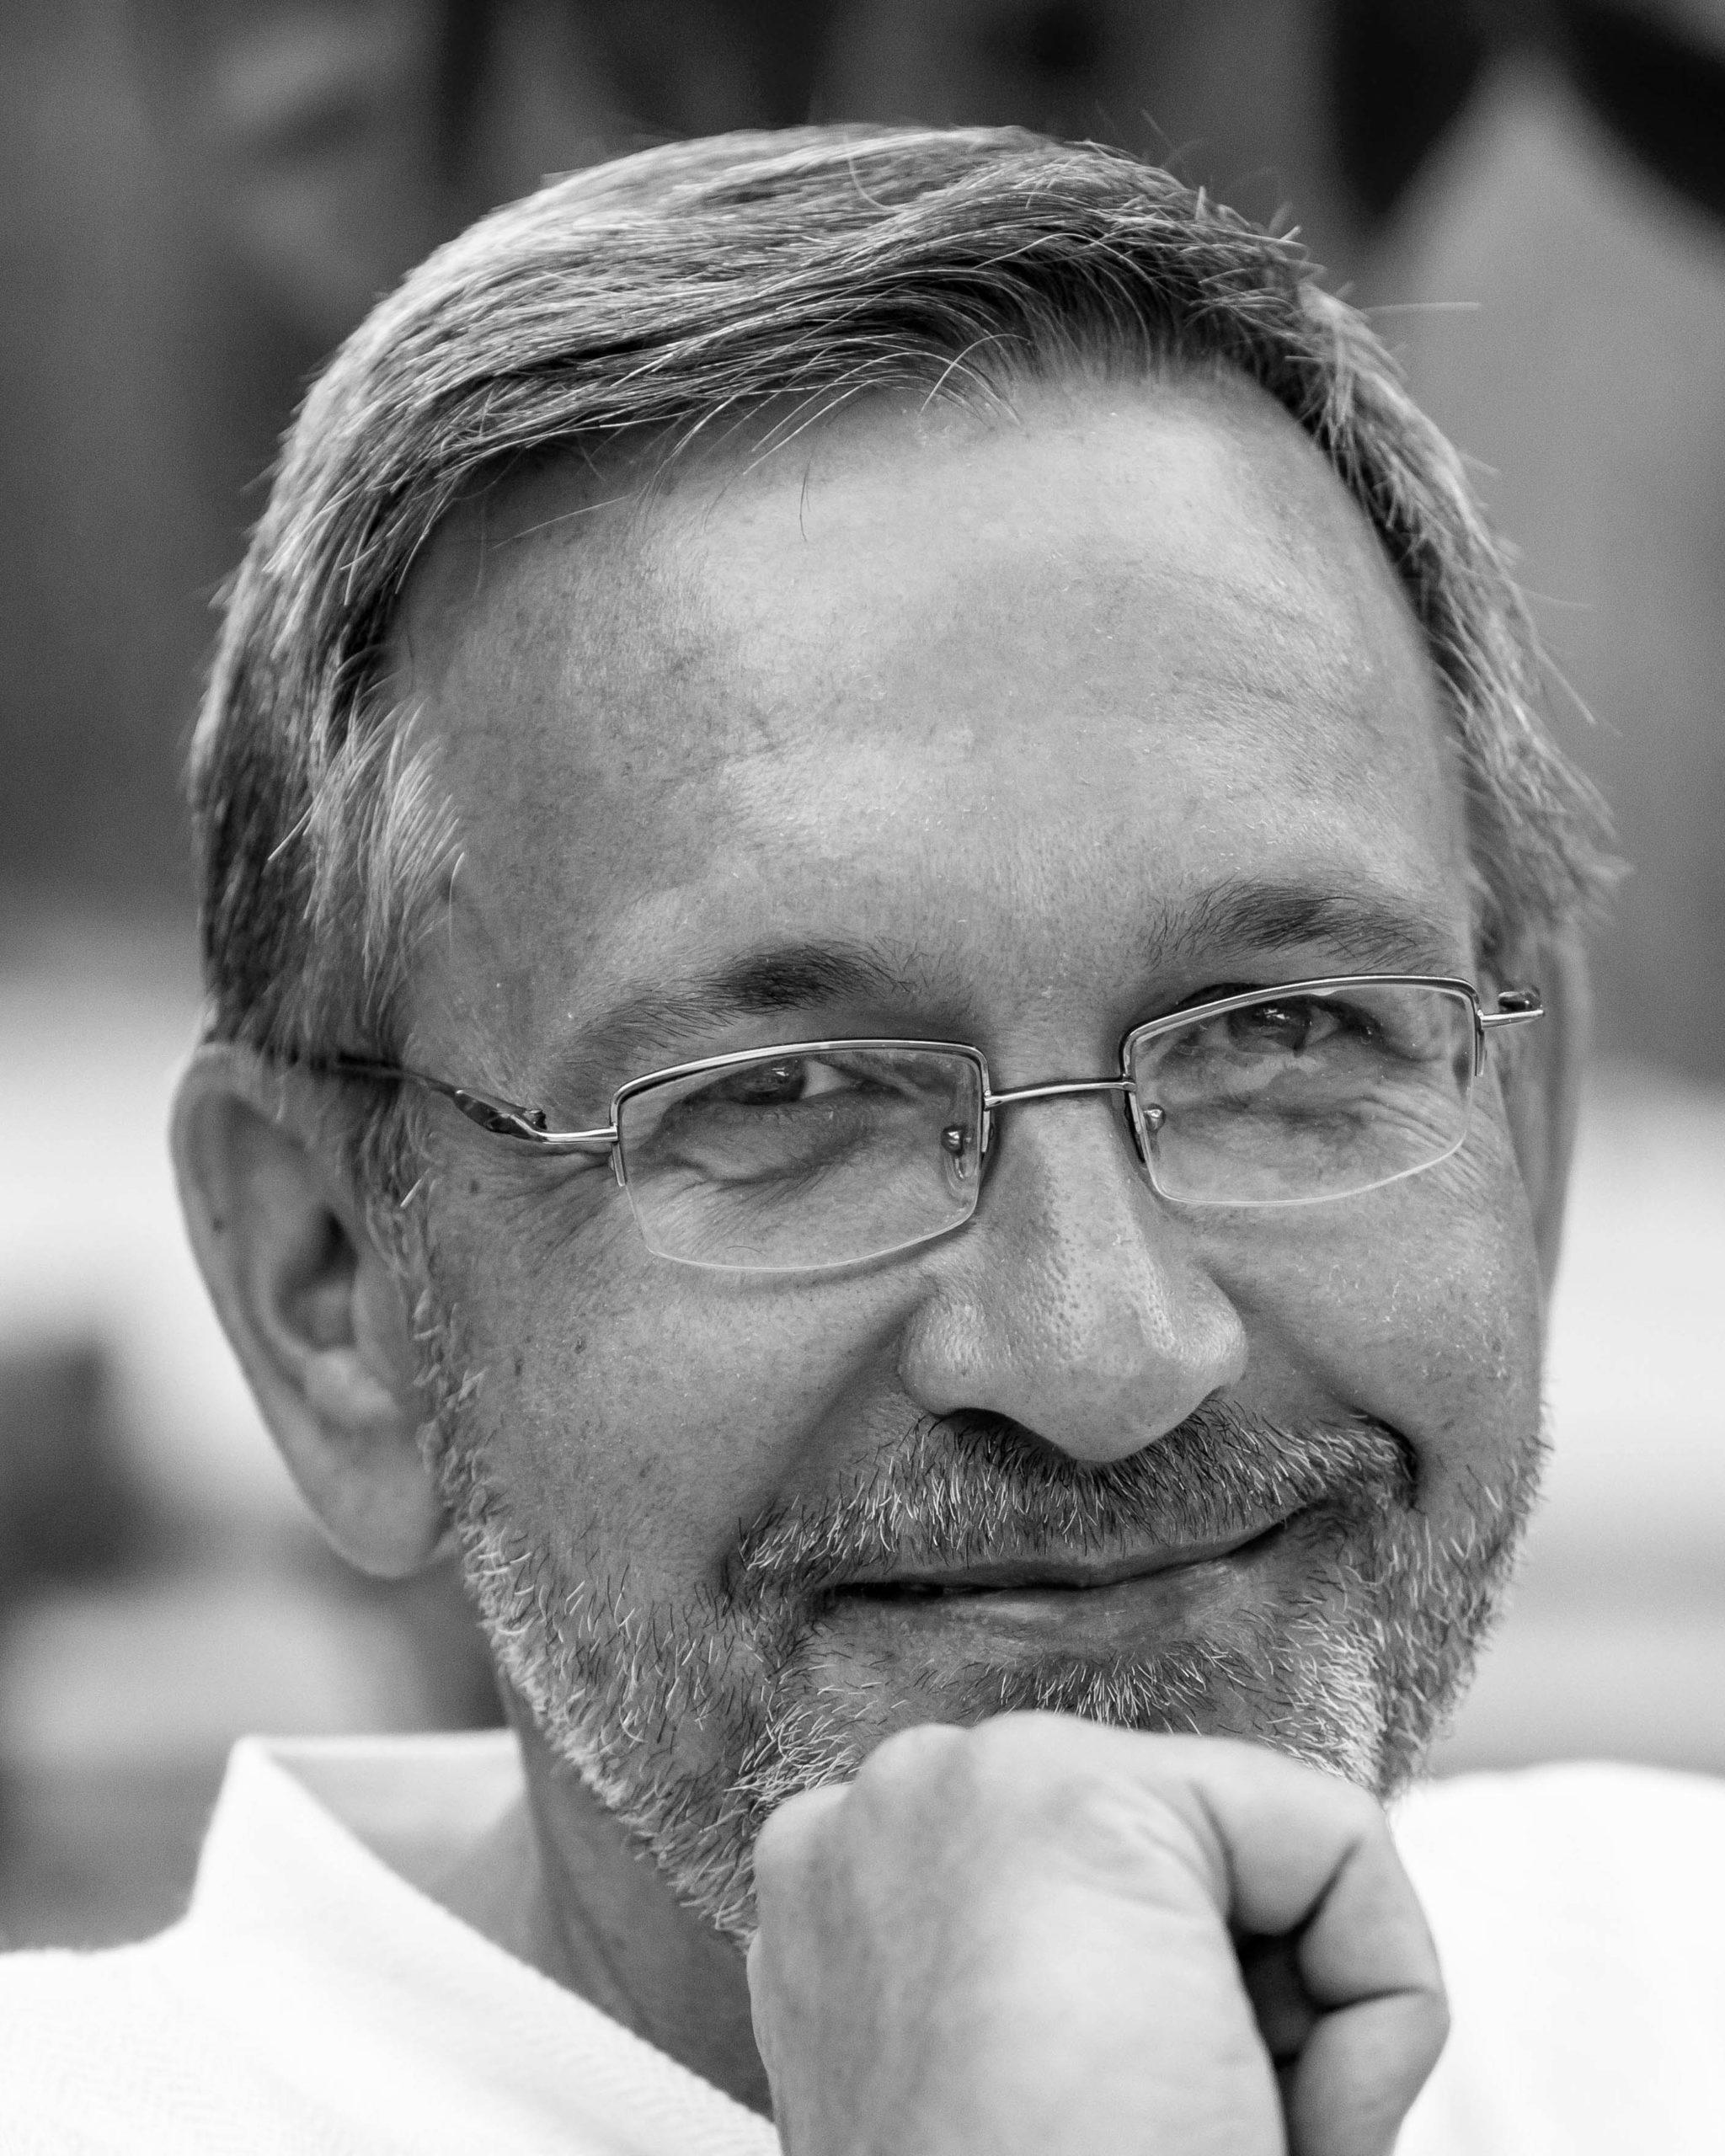 Lars Peter Hegenberg